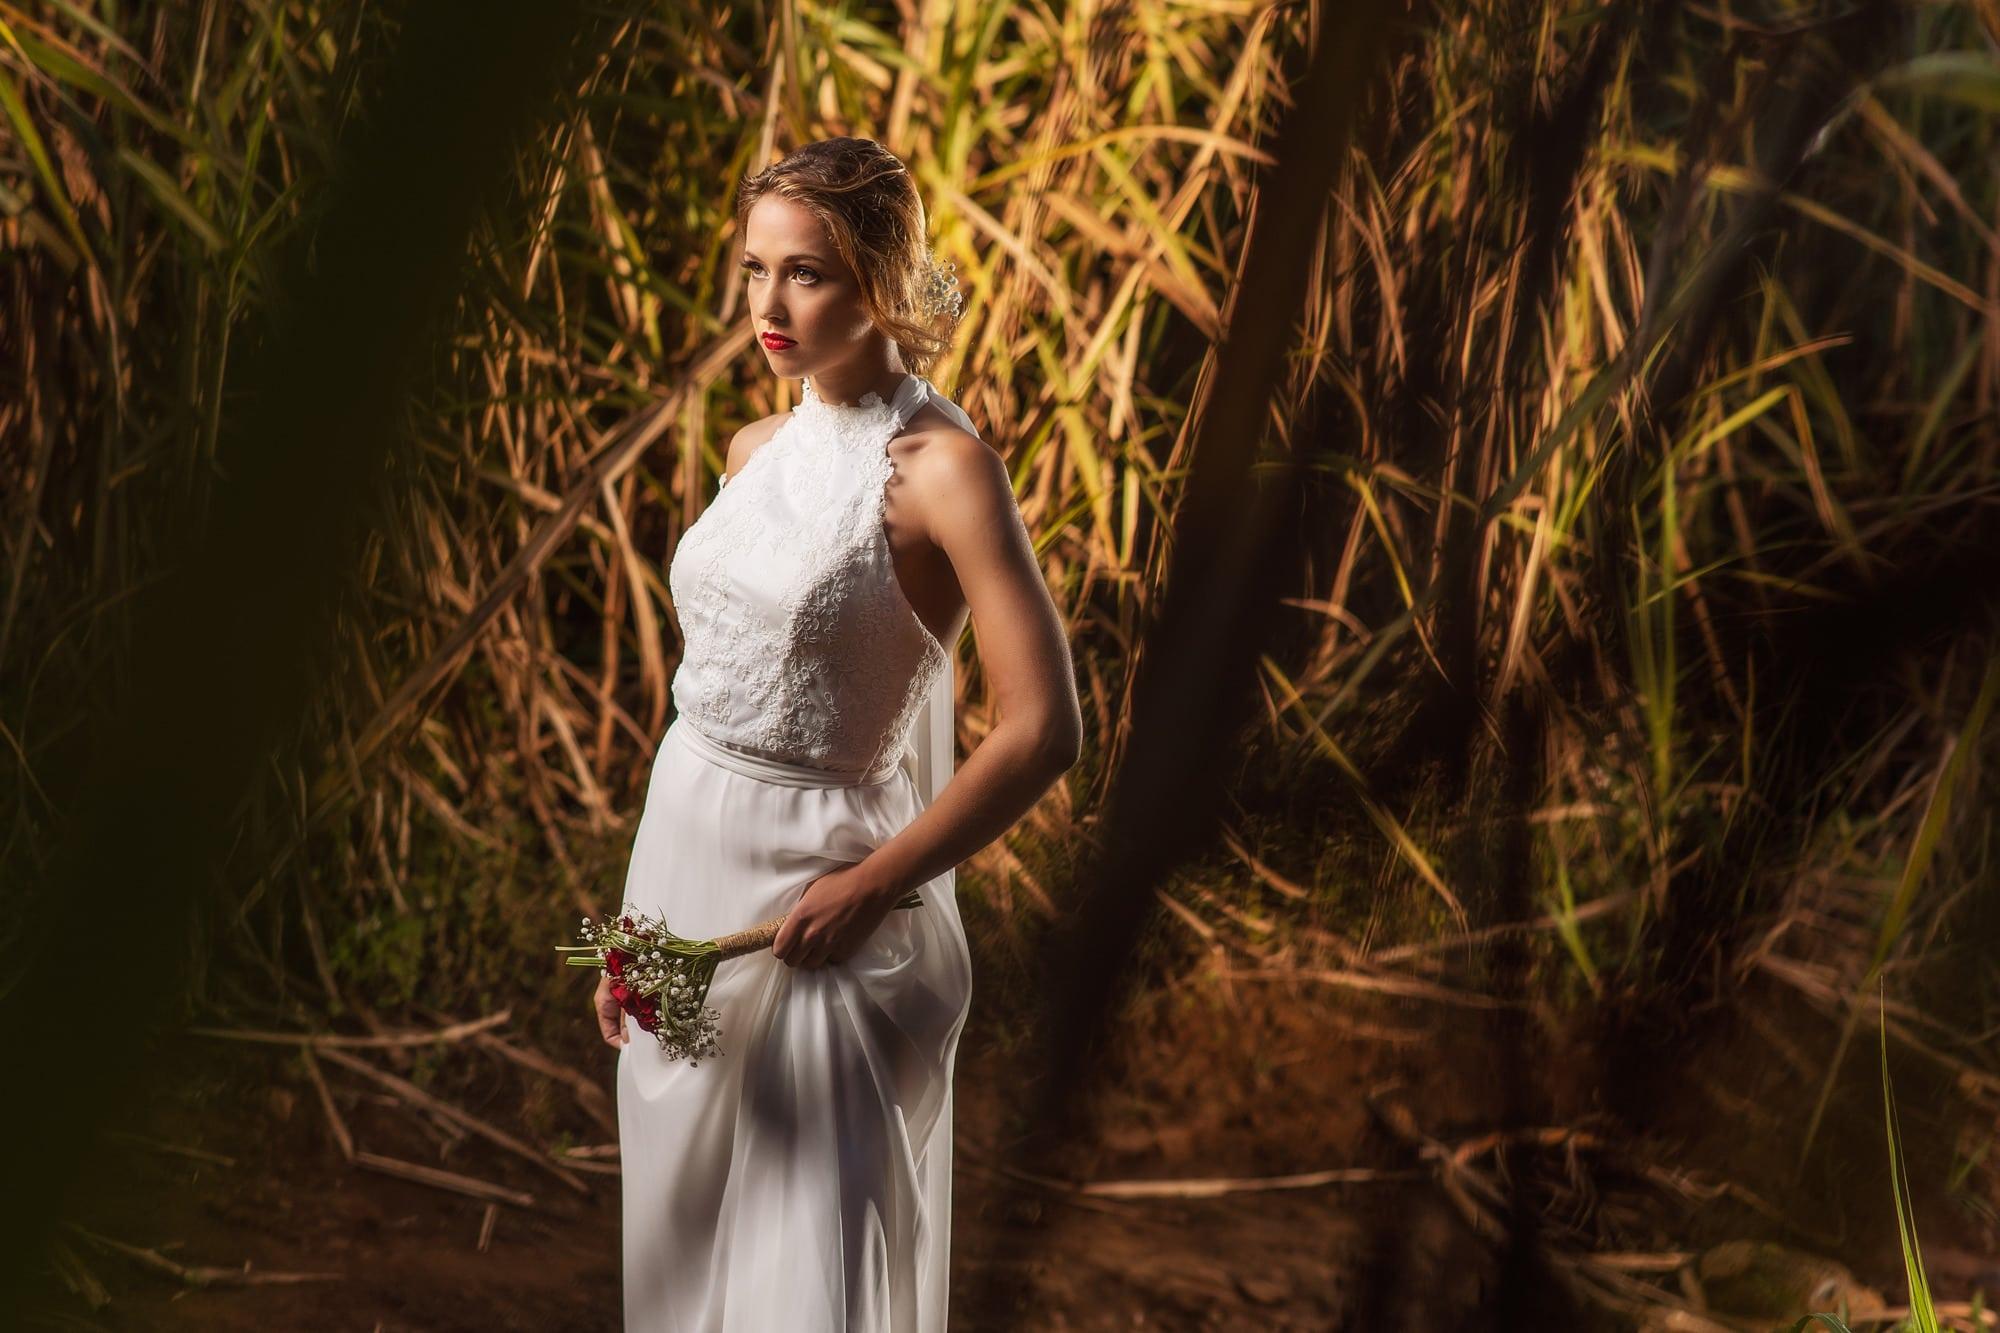 Sugar cane photoshoot Bridal session-6.jpg